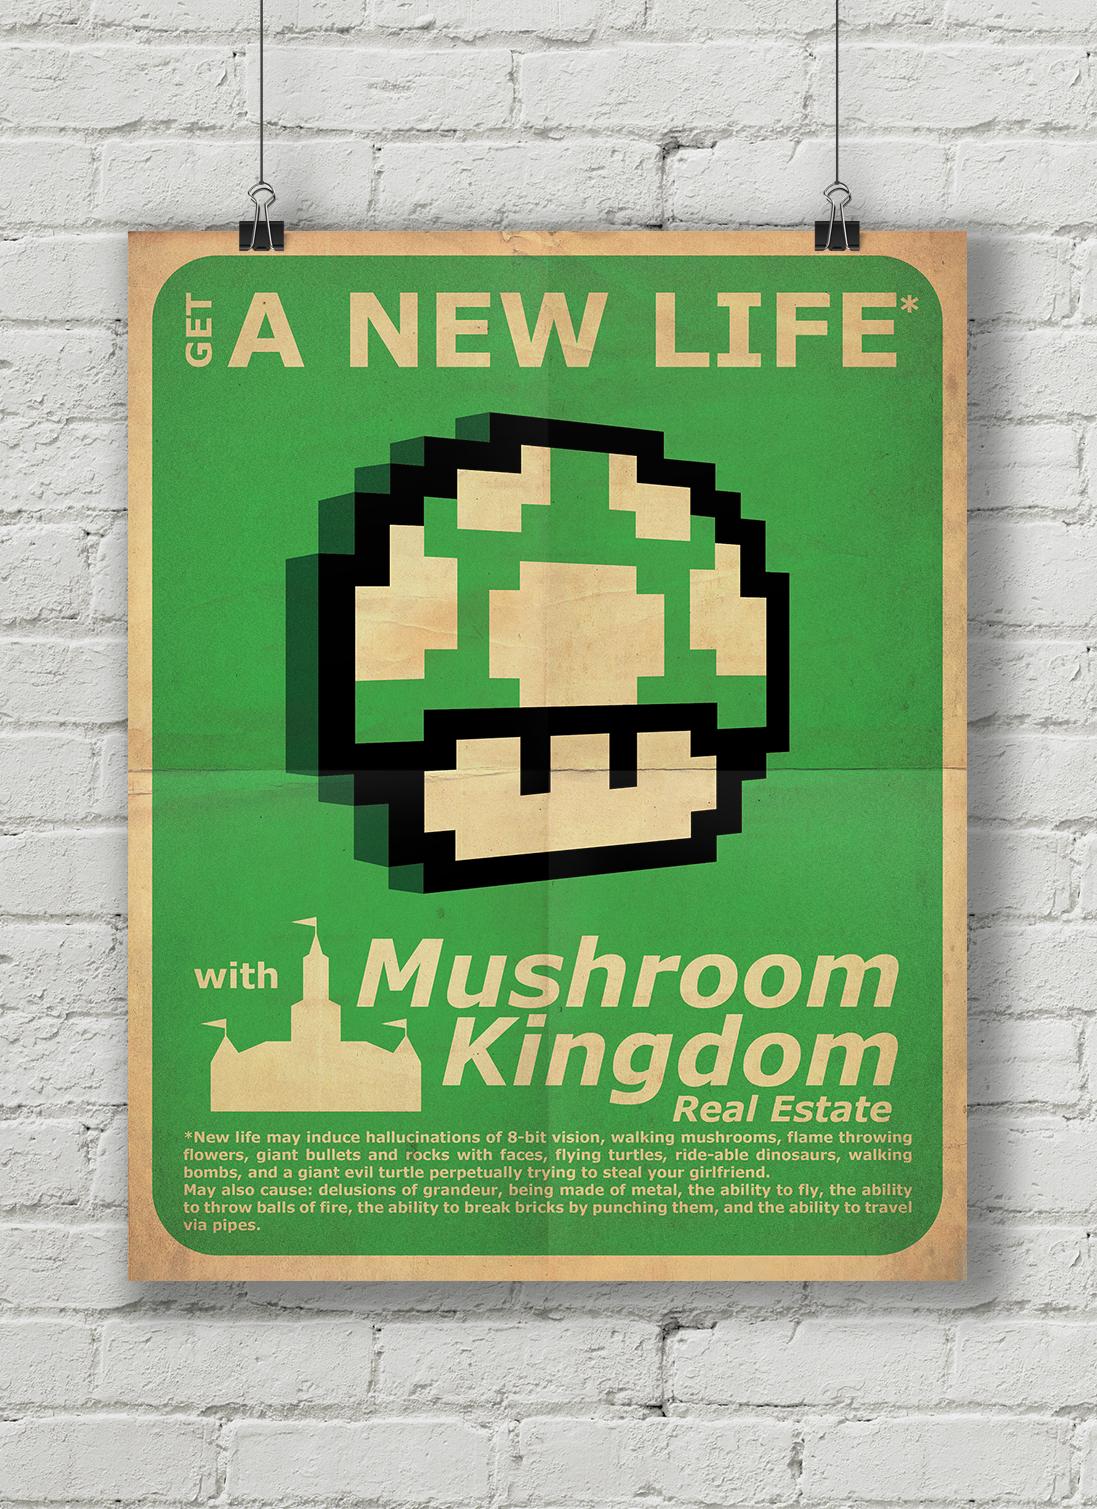 New life mock